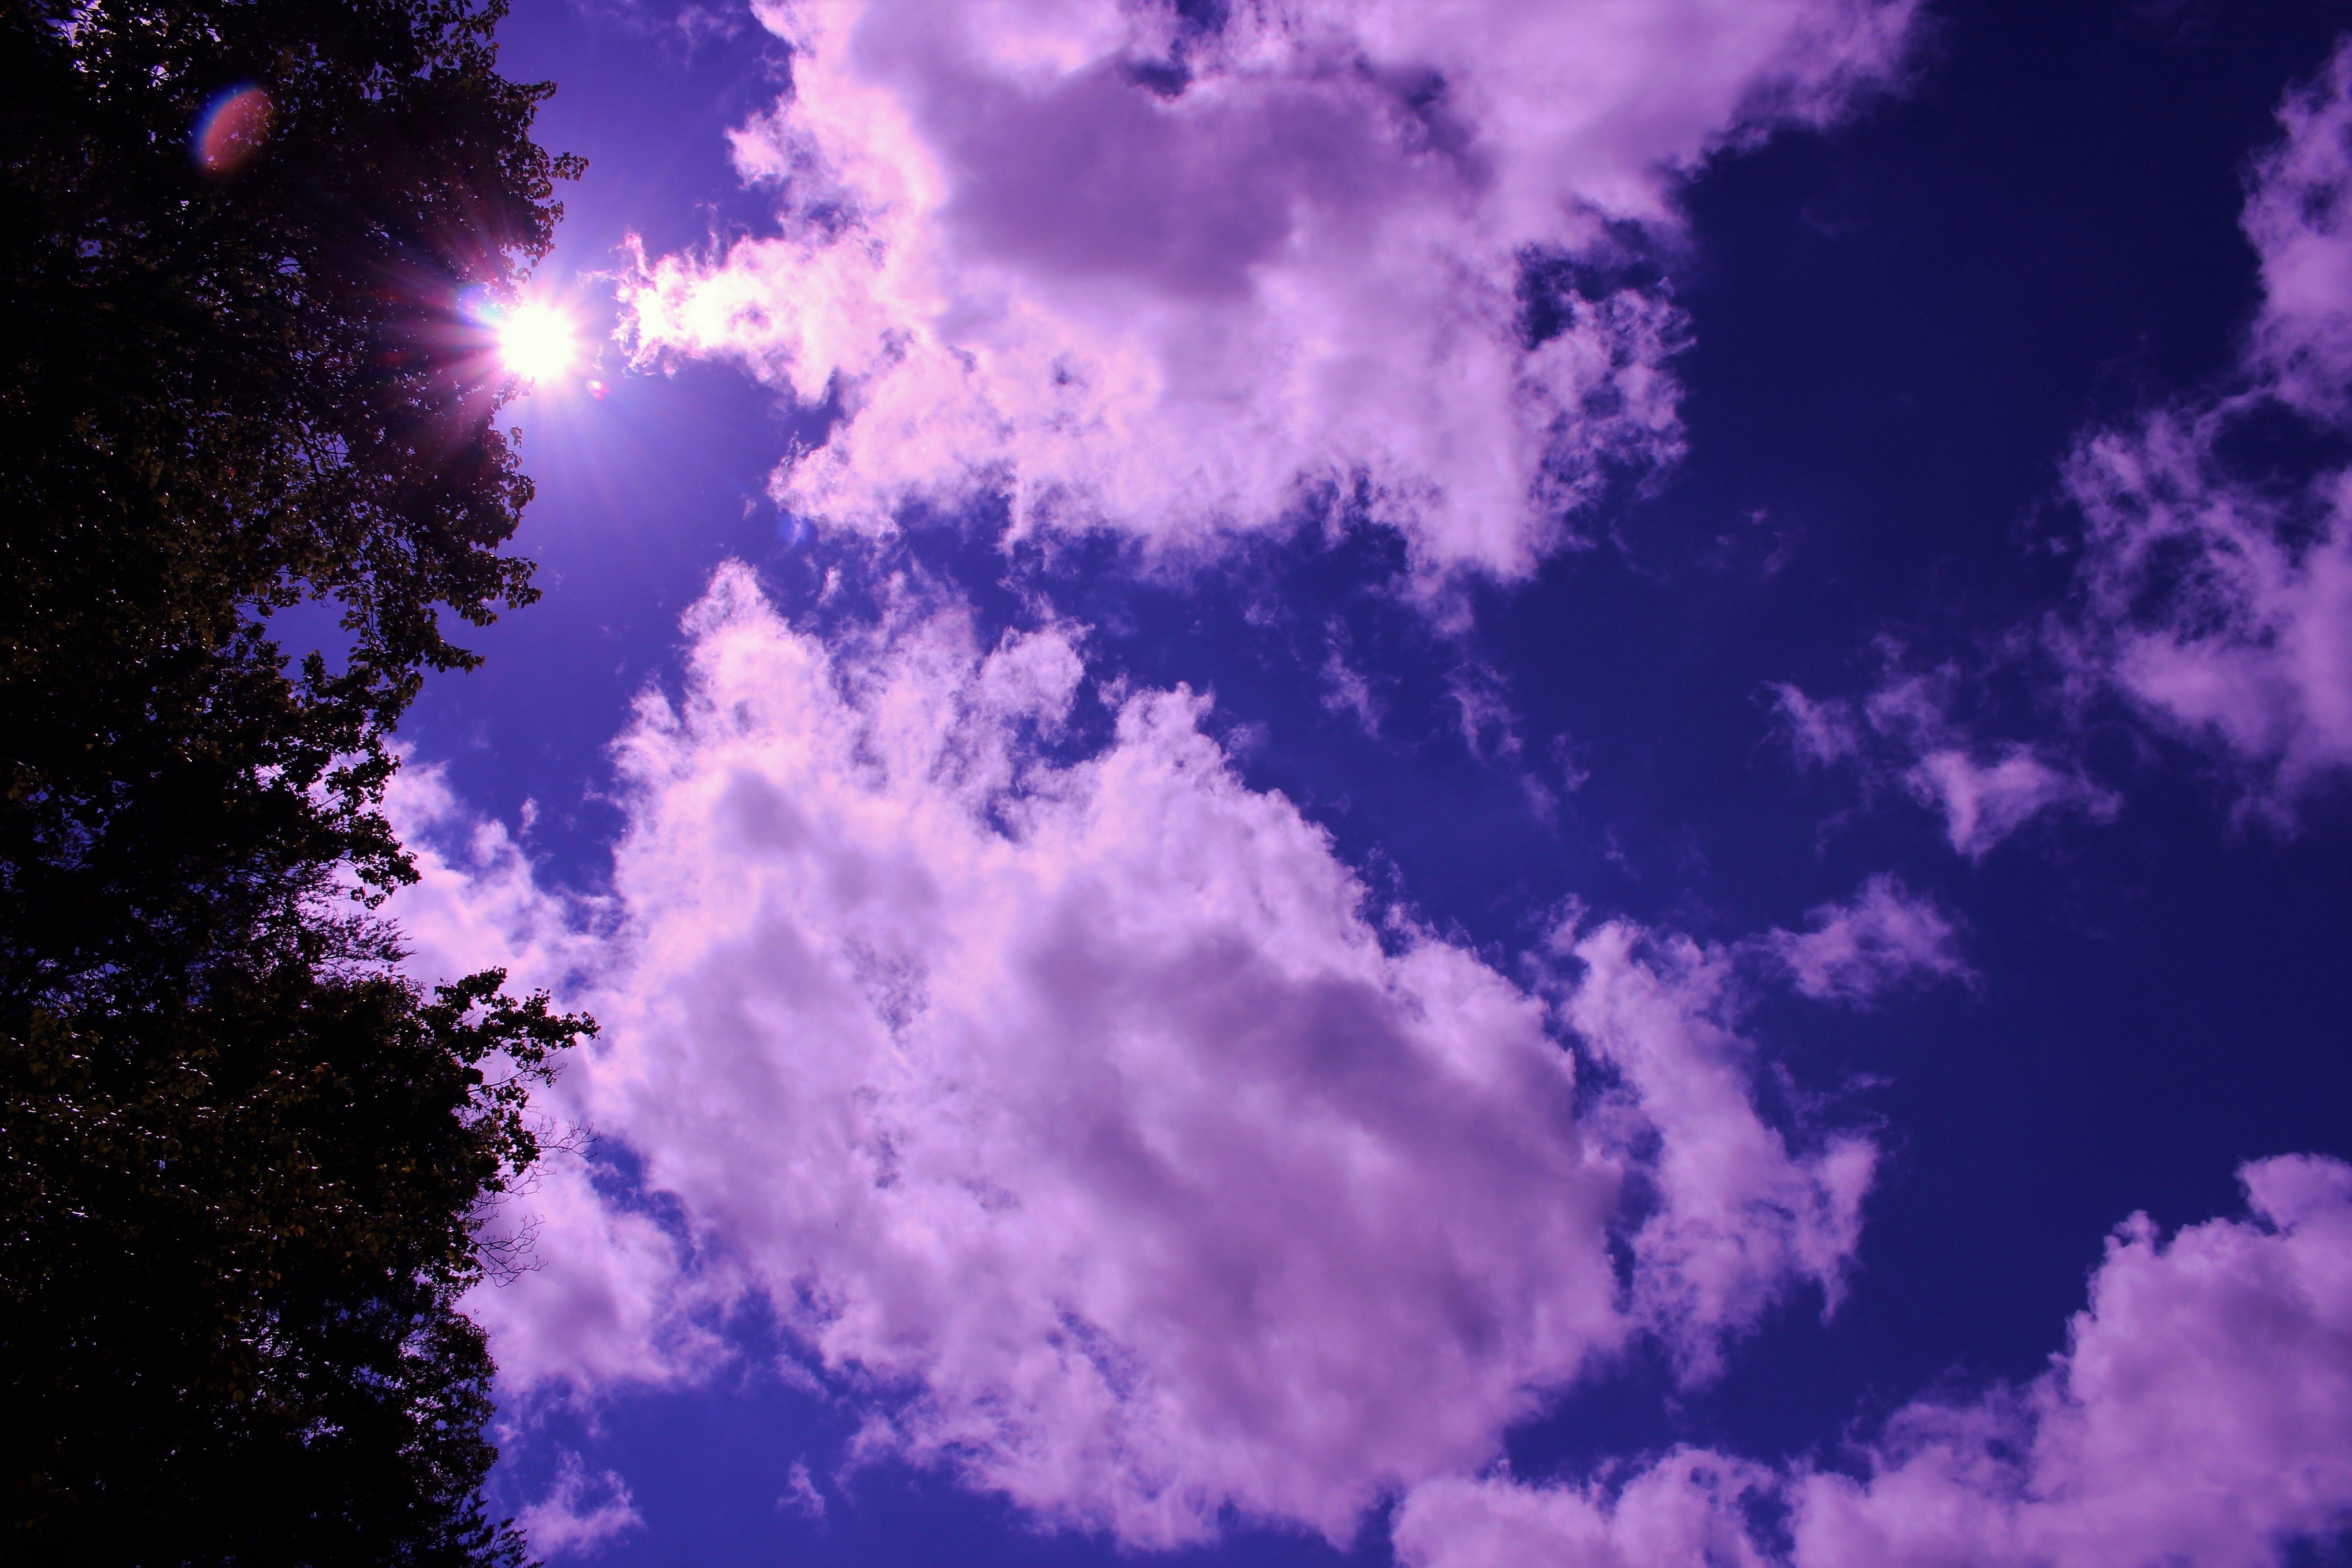 Kostenloses Stock Foto zu blauer himmel, fackel, himmel, lens flare